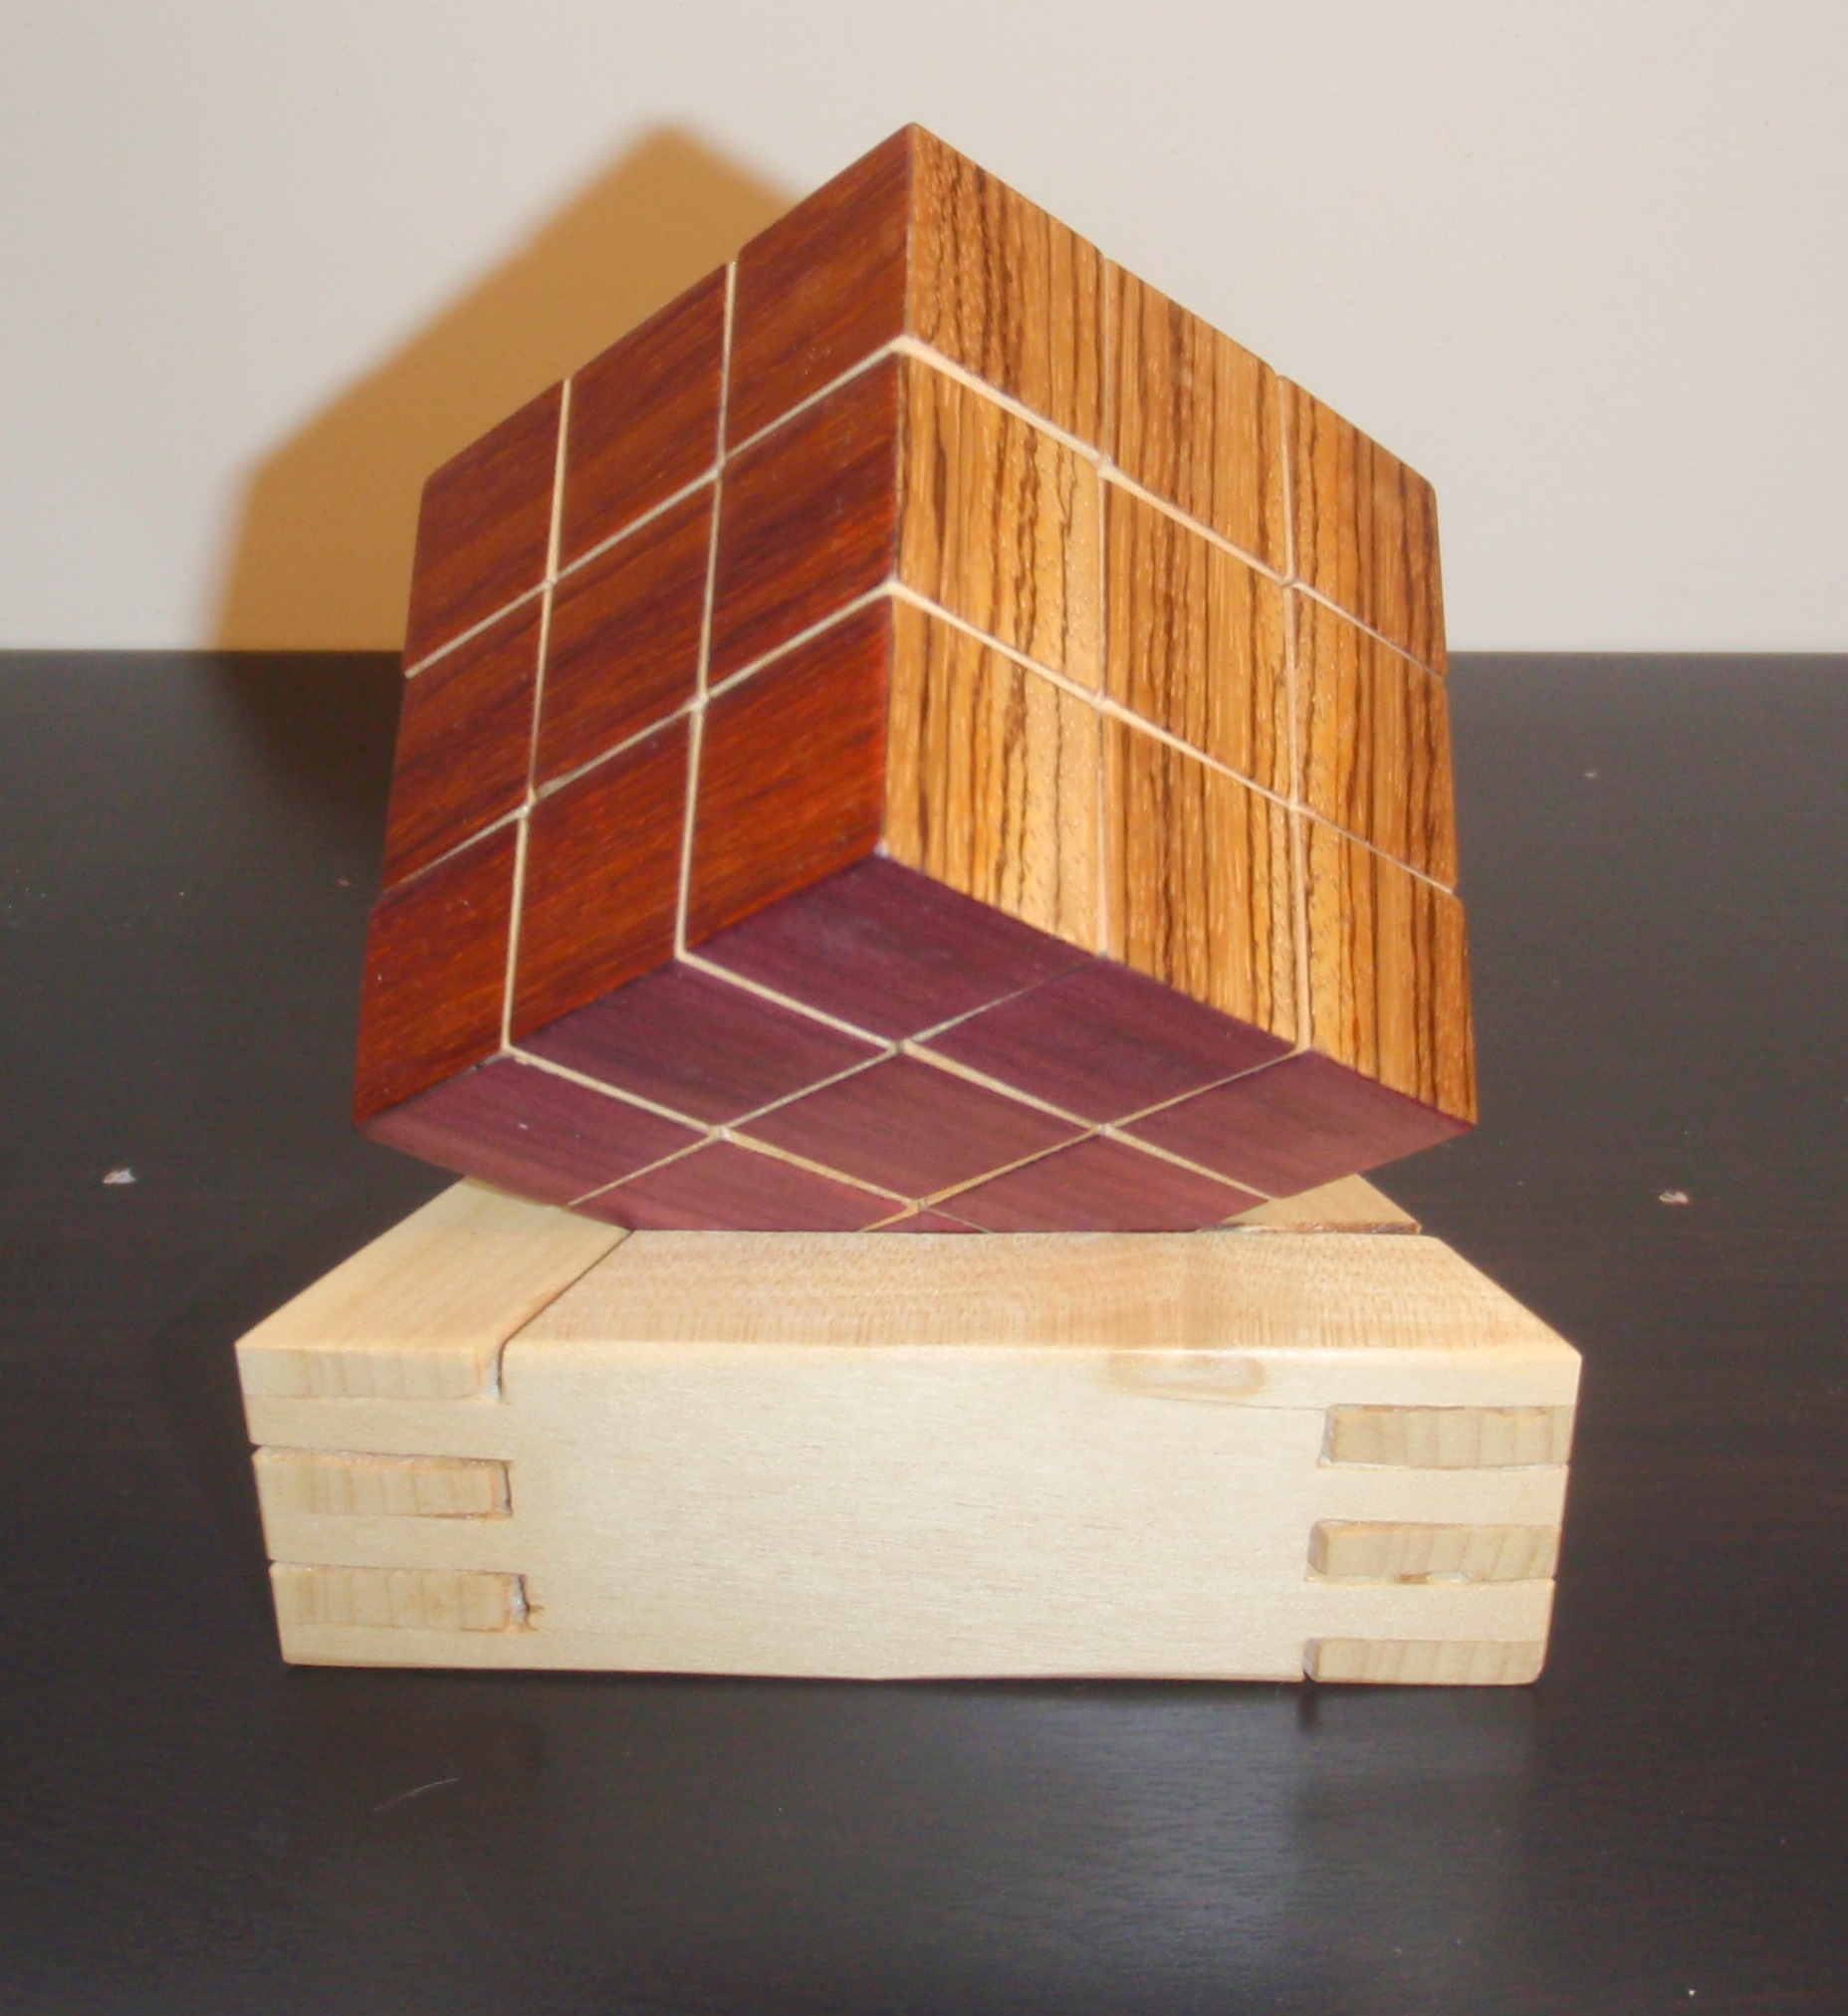 Wooden/Magnetic Rubik's Cube